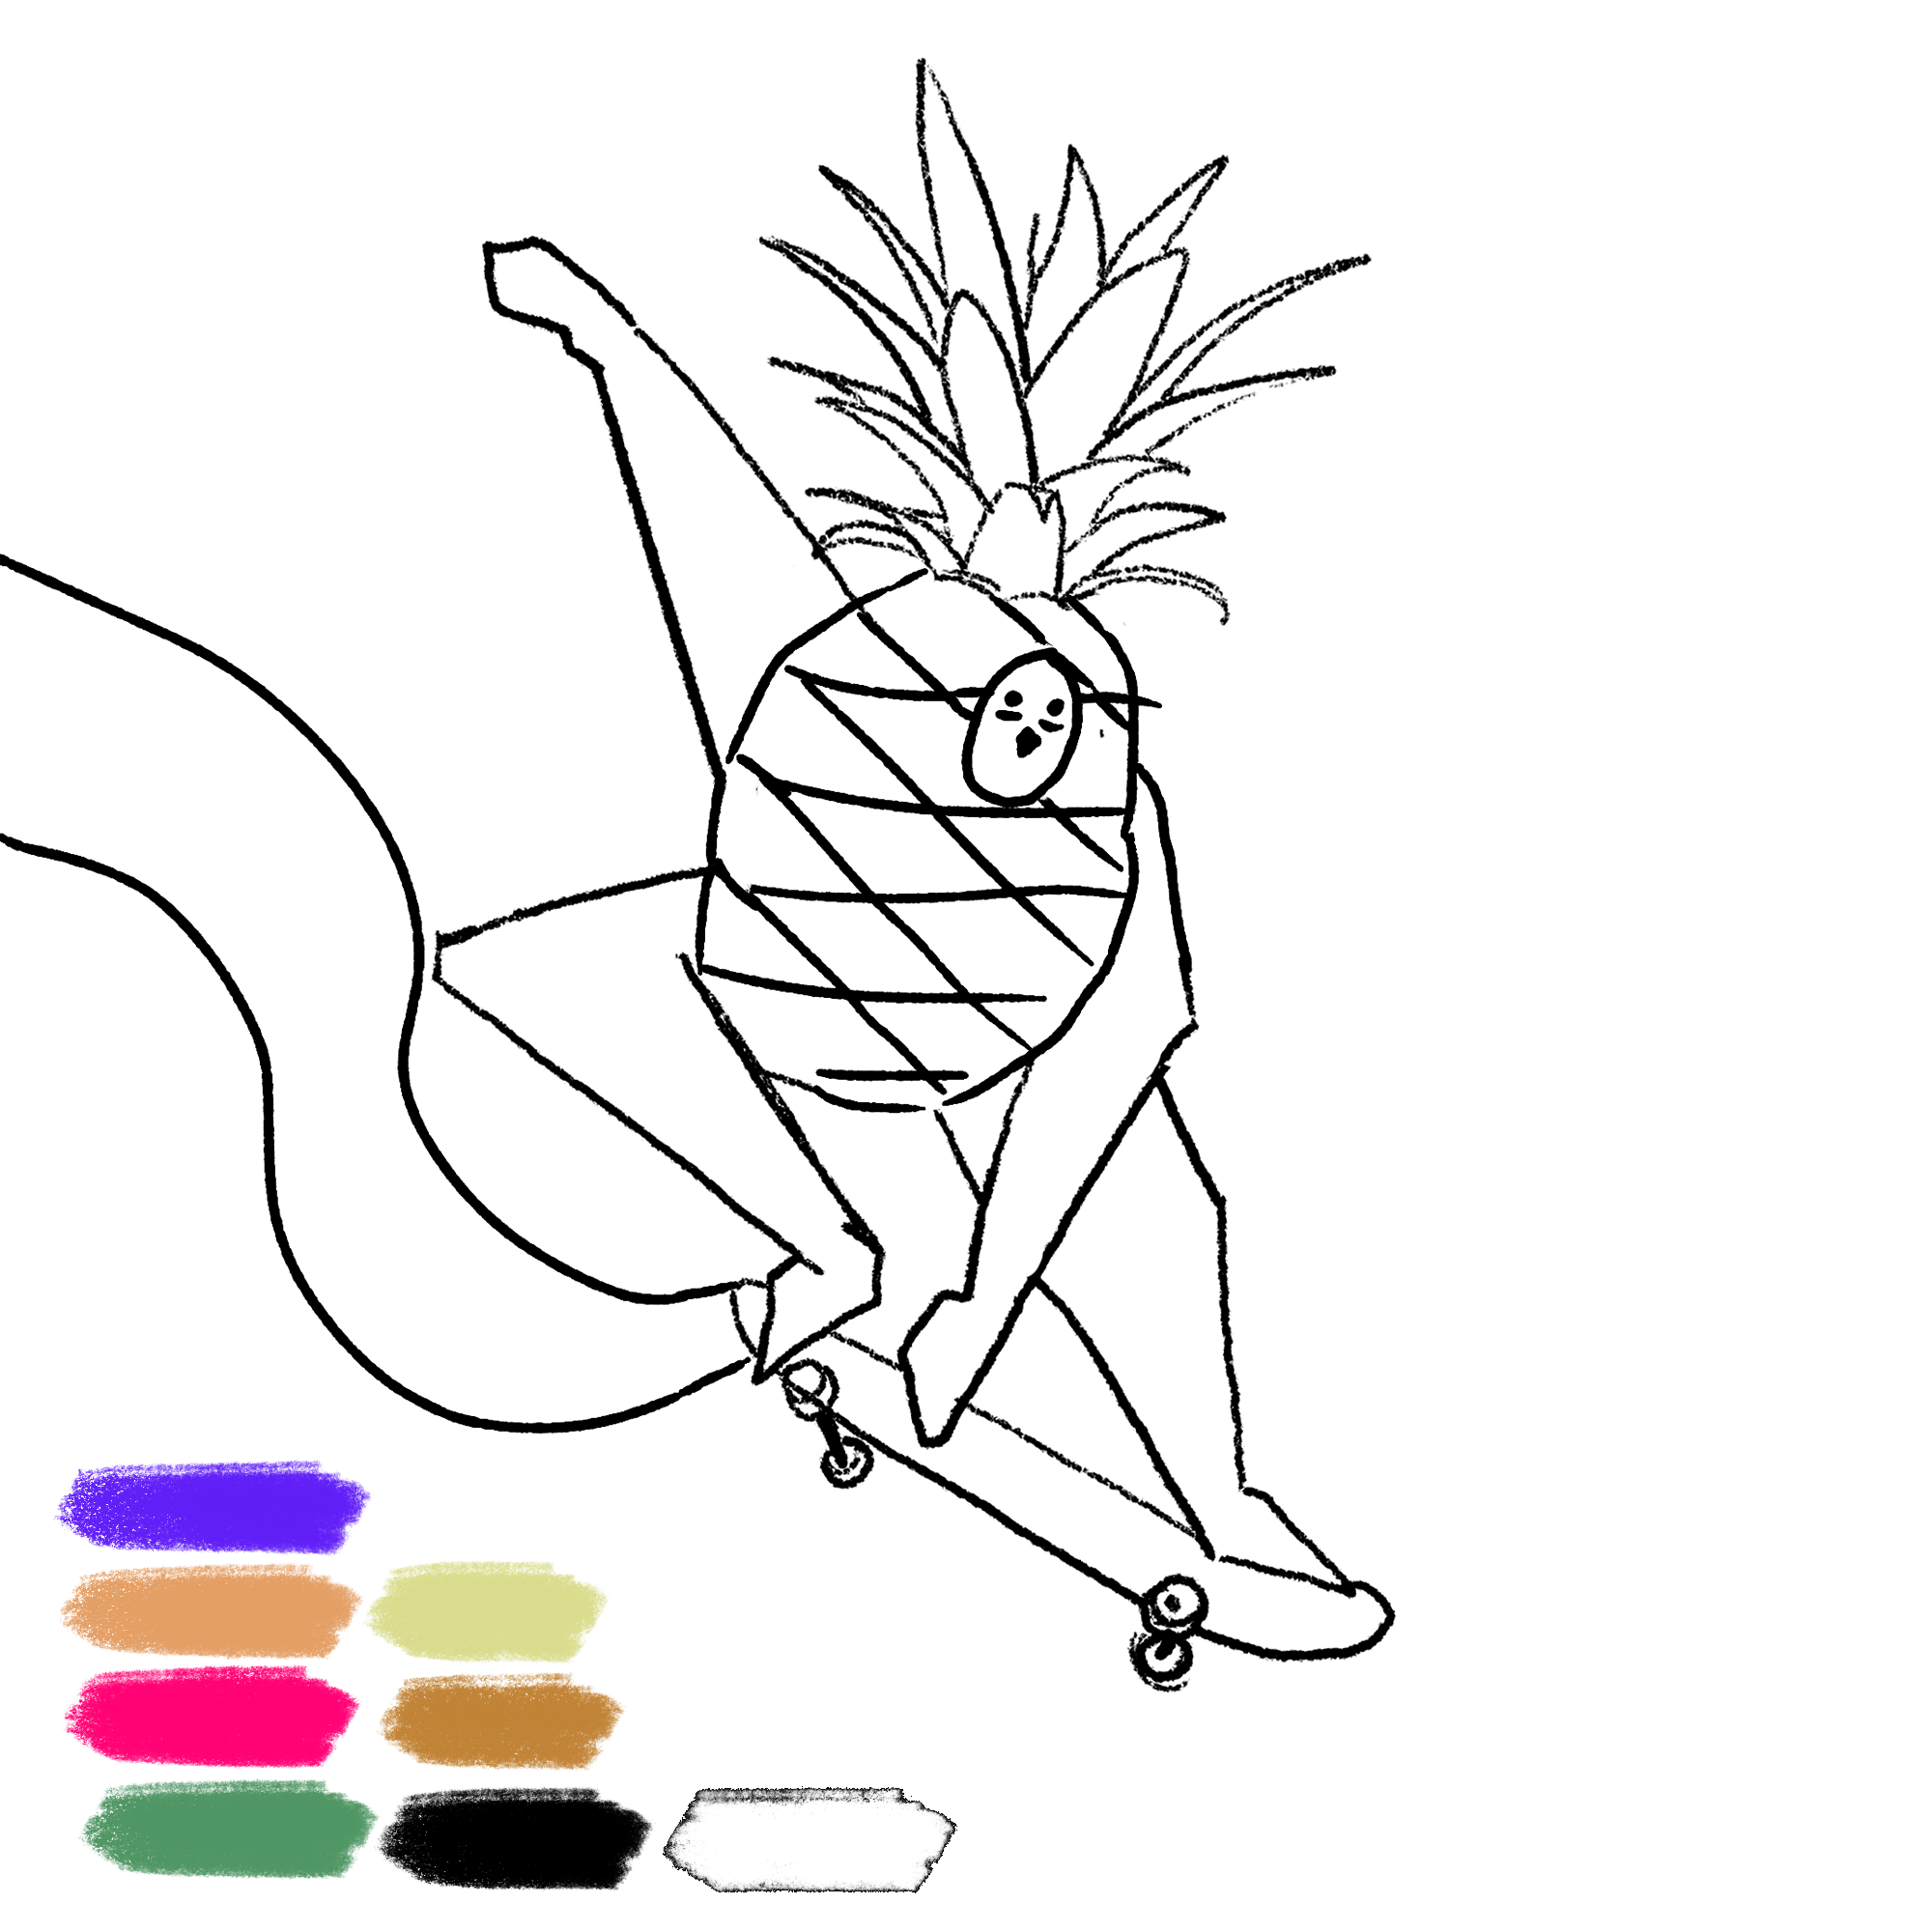 pineapple-guy-raff